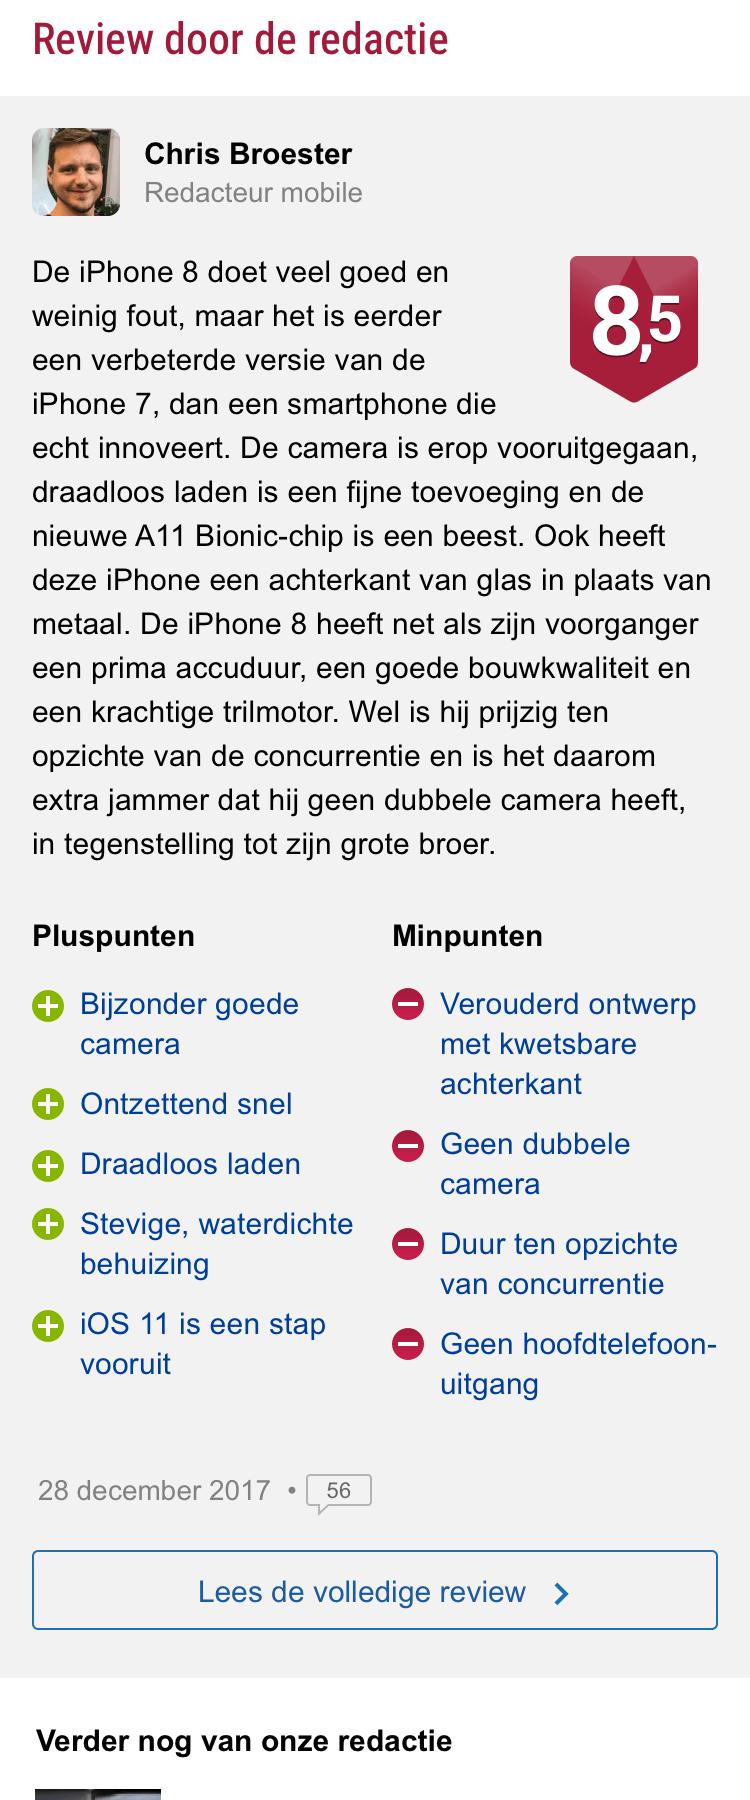 Reviewoverzicht - redactionele review